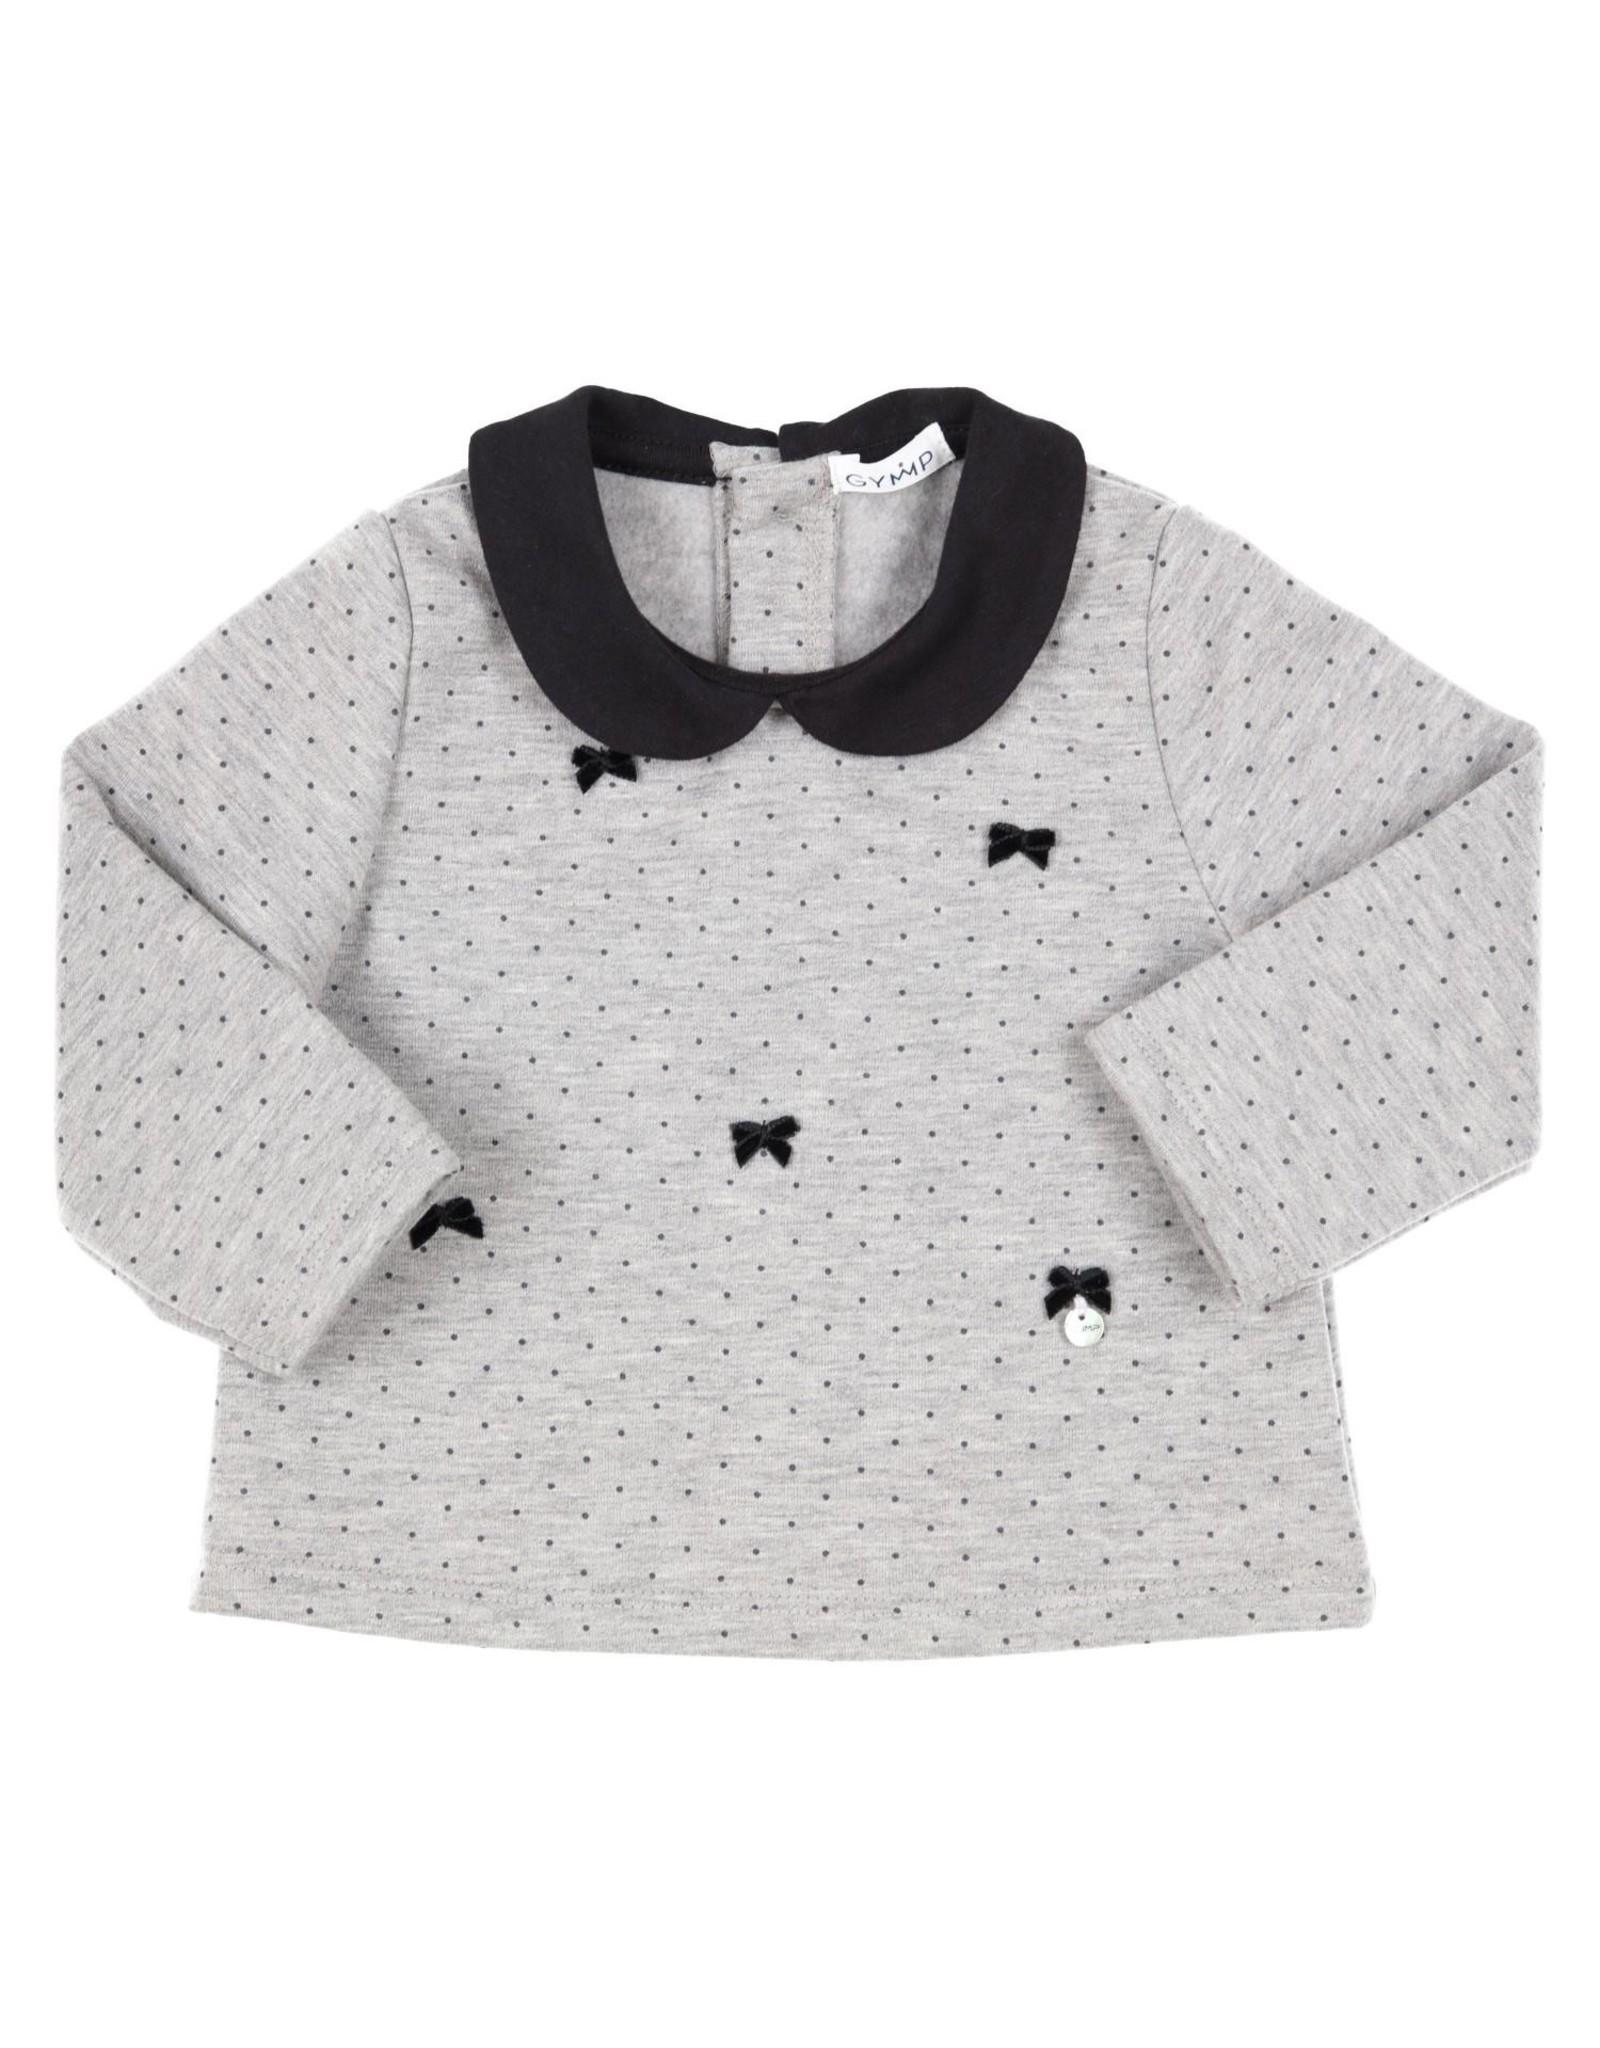 Gymp Sweater met Strikjes en lcaudine Kraagje Grijs